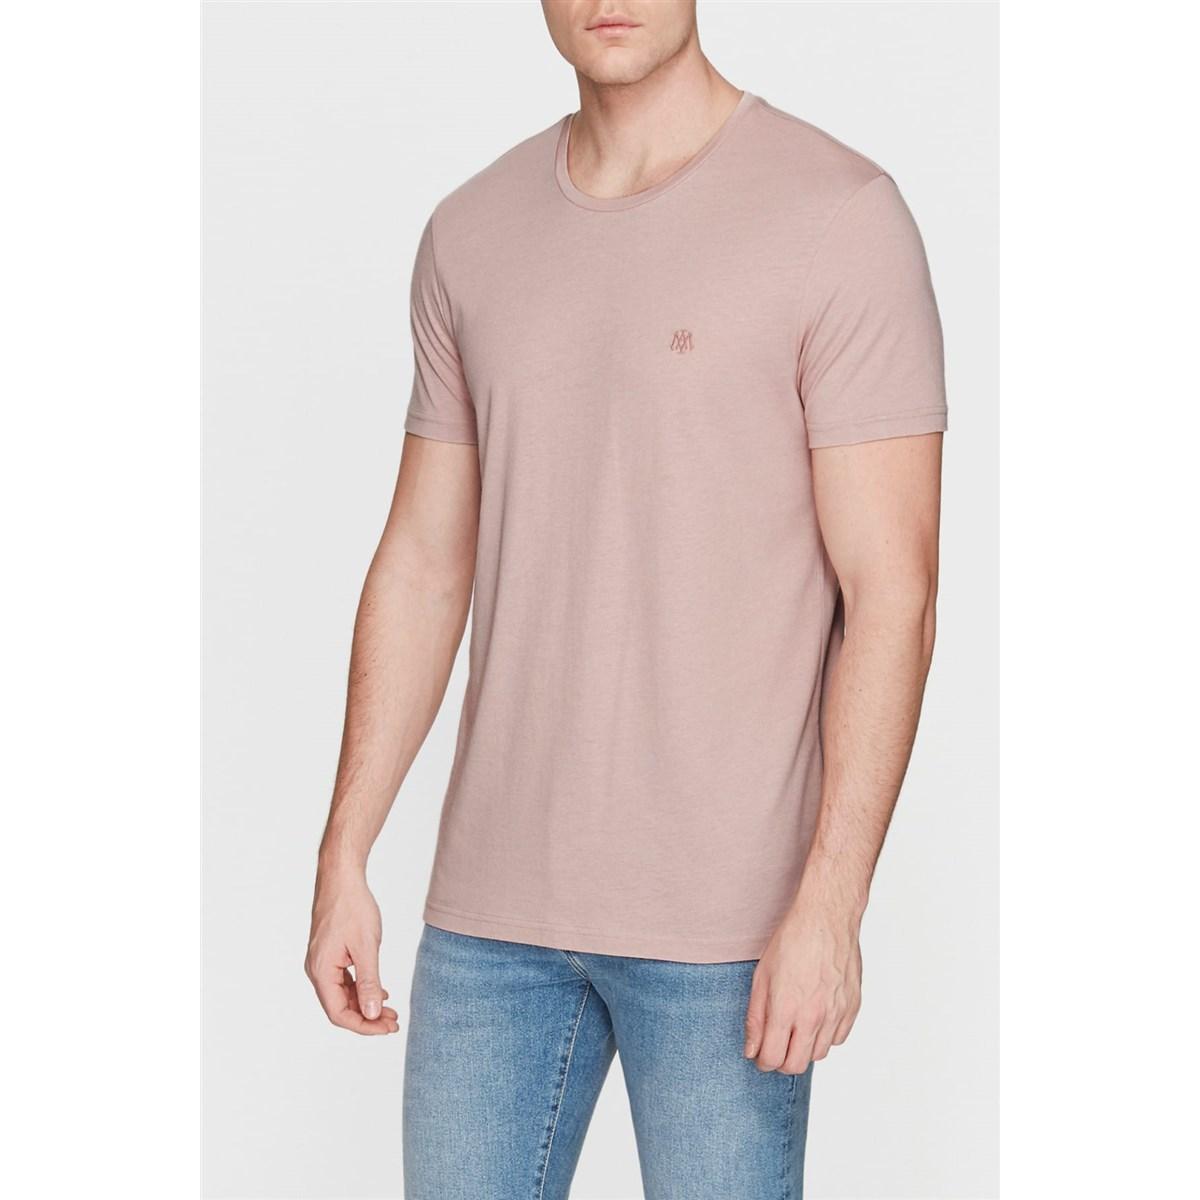 Tişört Soluk Gül Pembe